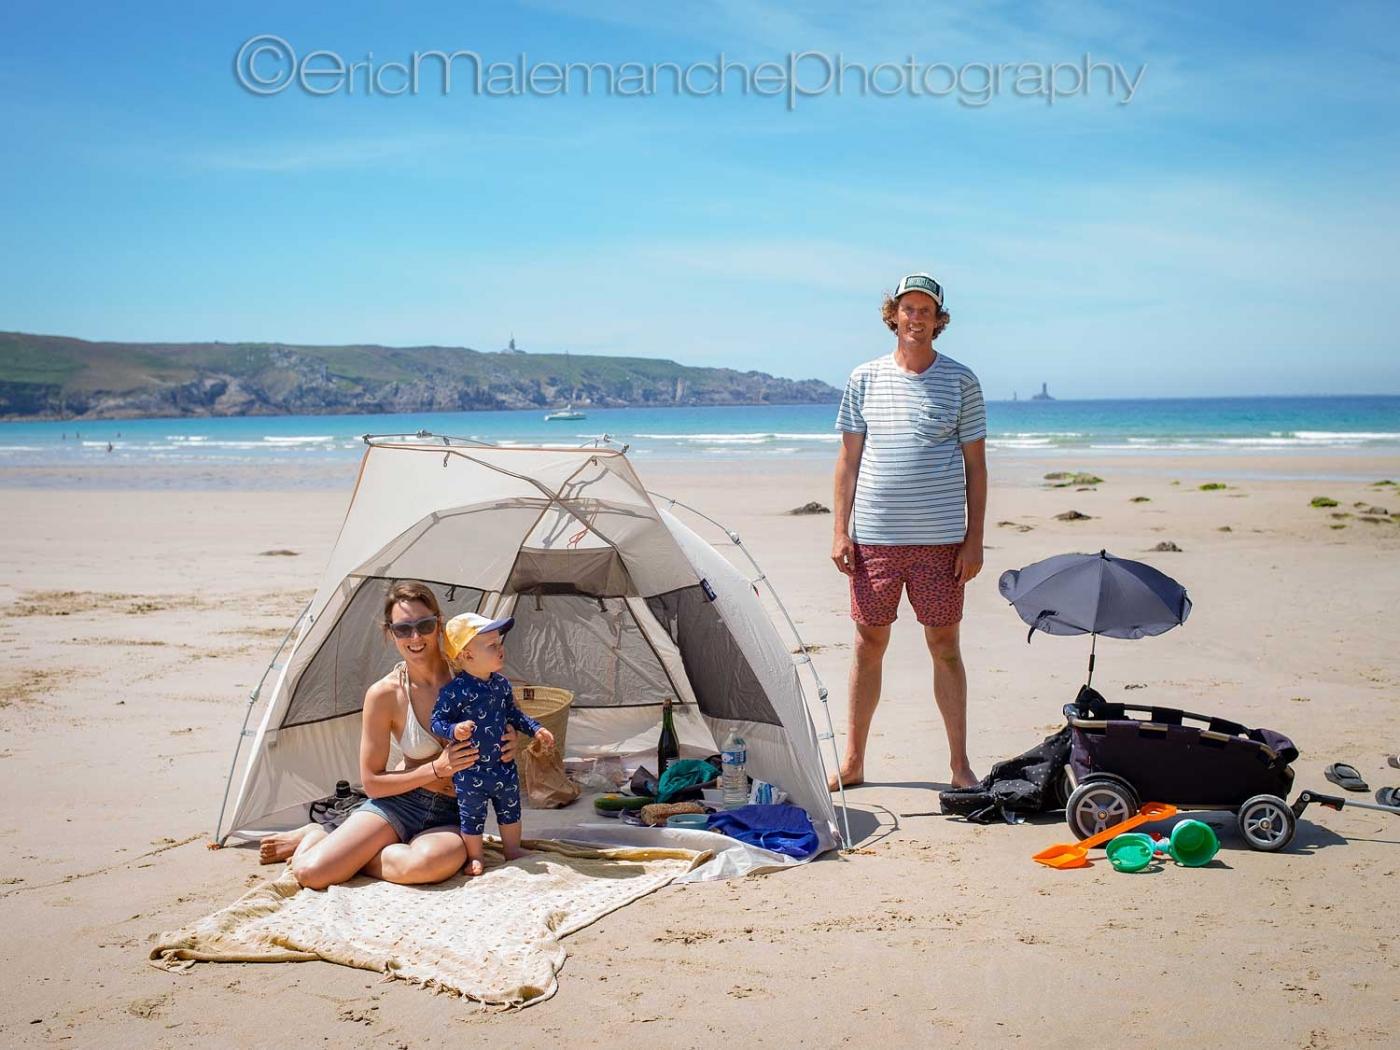 https://www.ericmalemanche.com/imagess/topics/les-conges/liste/vacances-bord-de-mer-2020.jpg